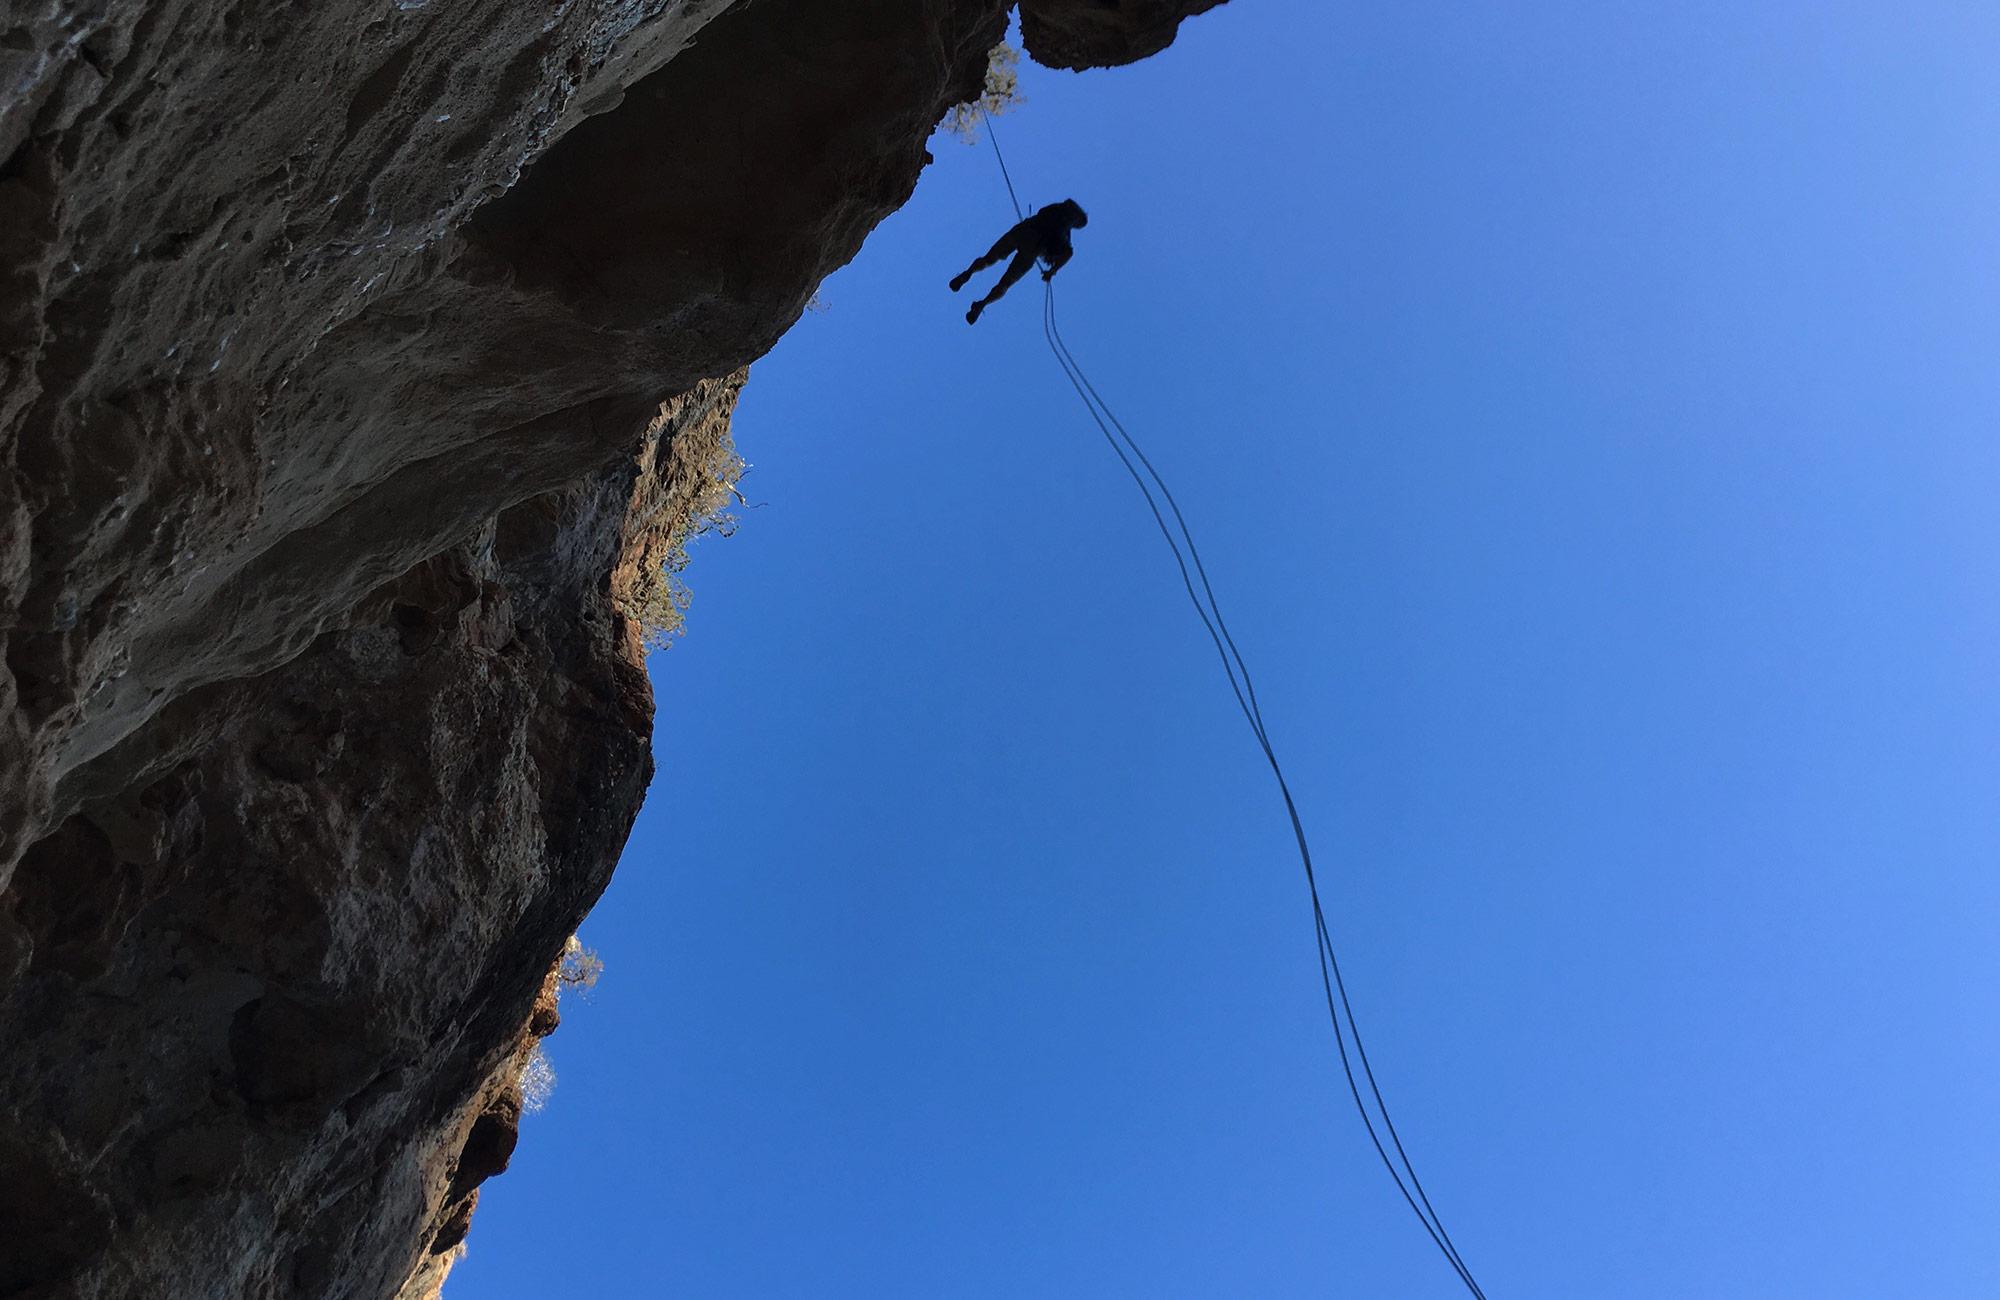 Sardinia ropes on Moondance teen tours